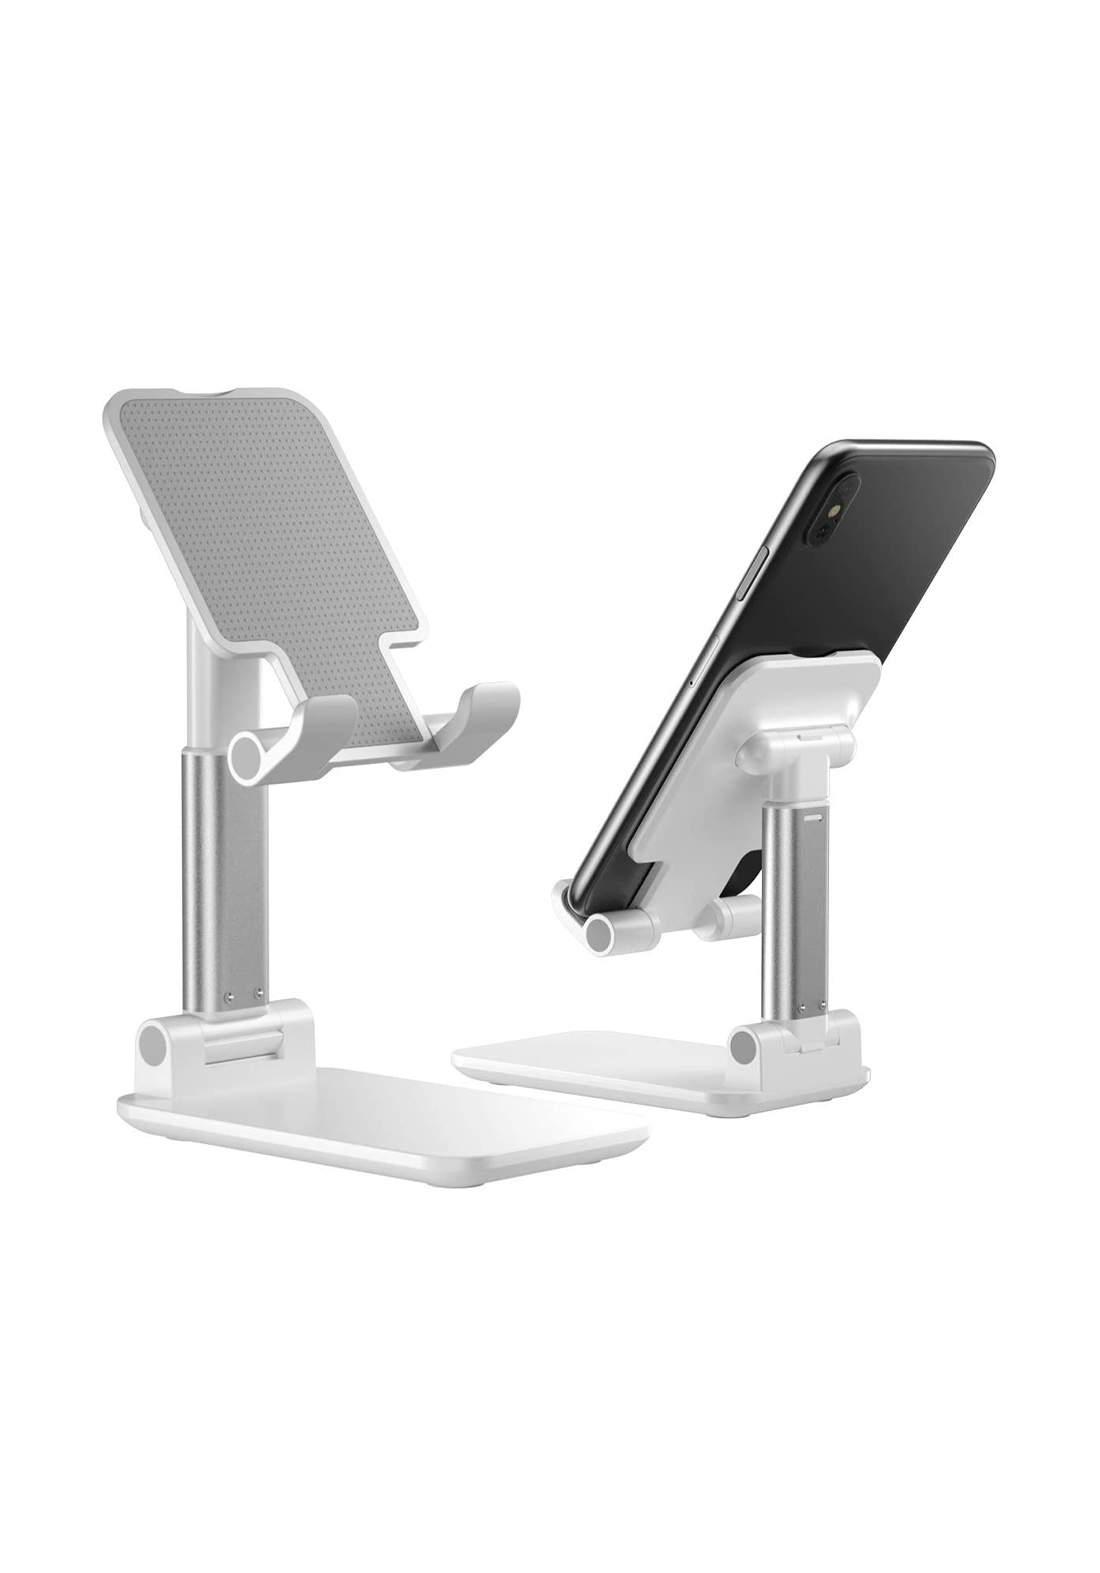 Folding Desktop Phone Stand حامل هاتف